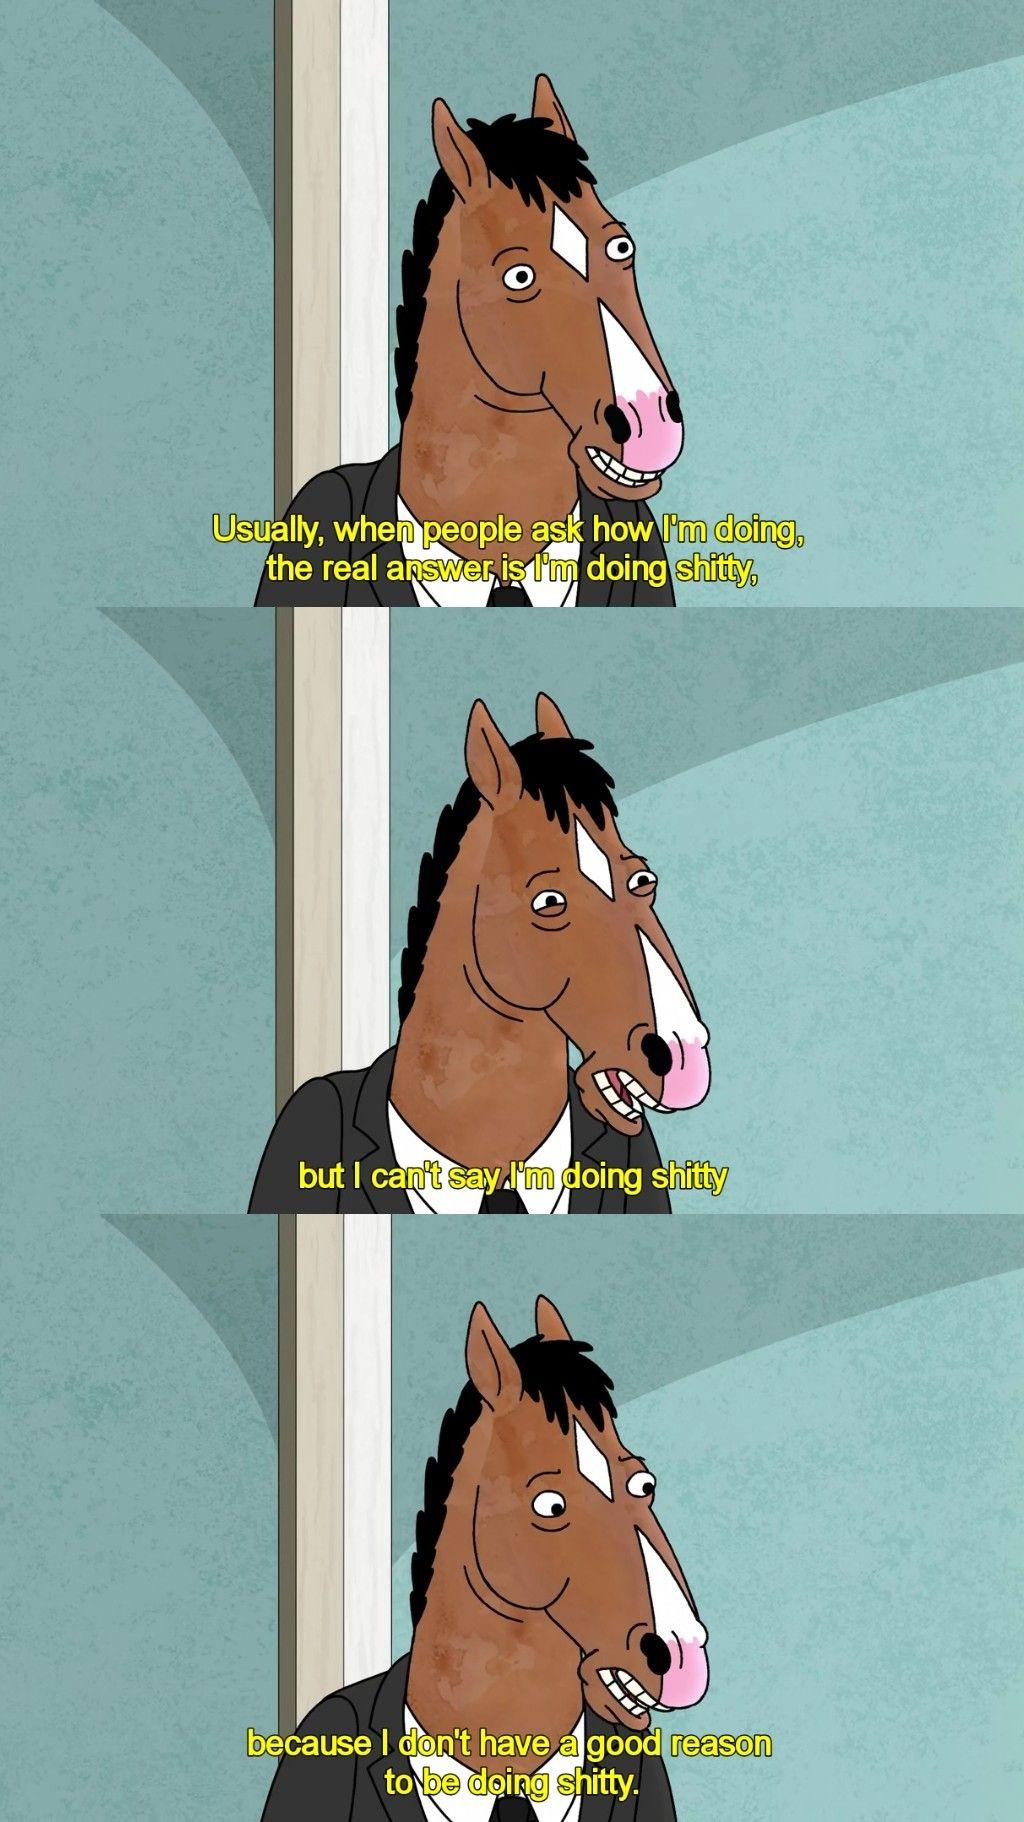 bojack horseman season 4 episode 6